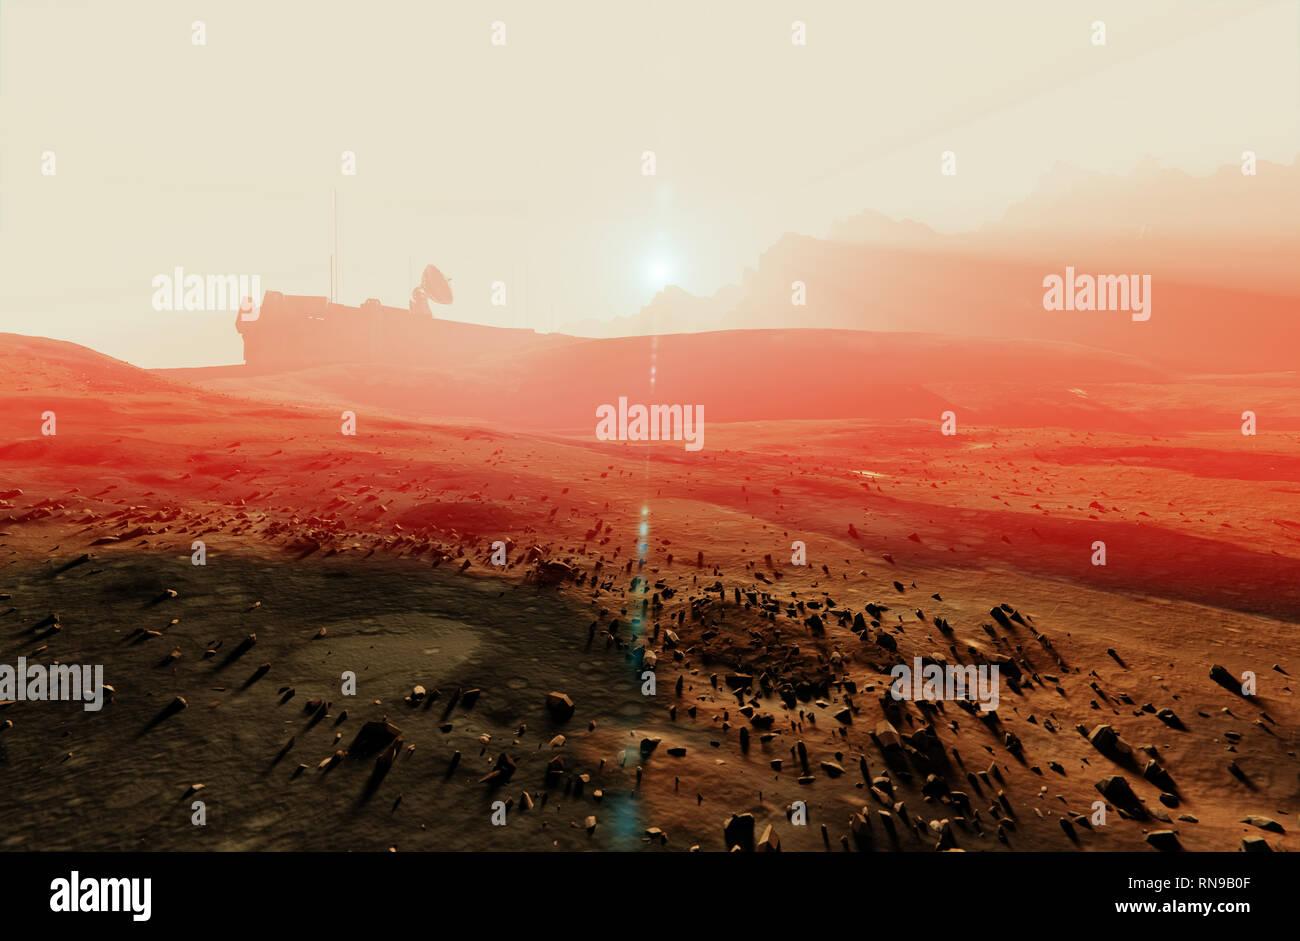 Red planet Mars misty sunset landscape, desert rocks, space base radar dish, 3d illustration Stock Photo